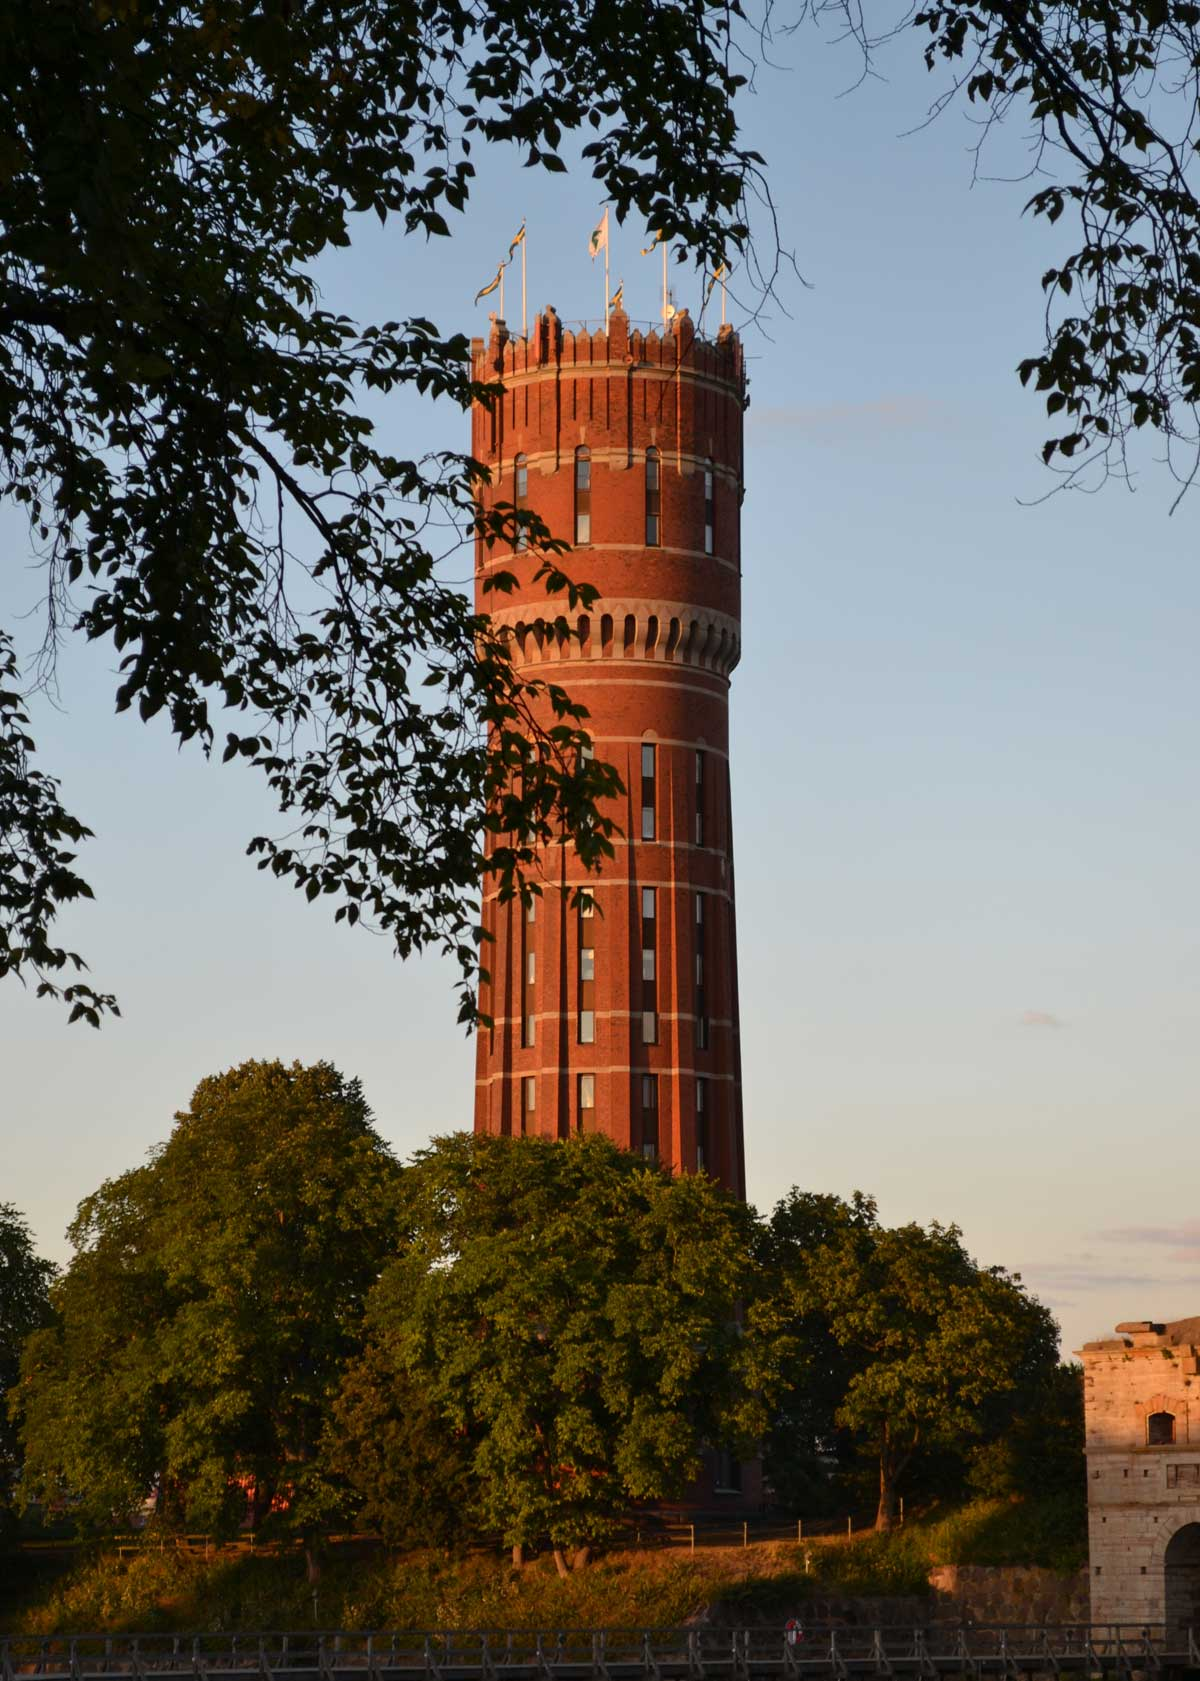 Wasserturm in Kalmar